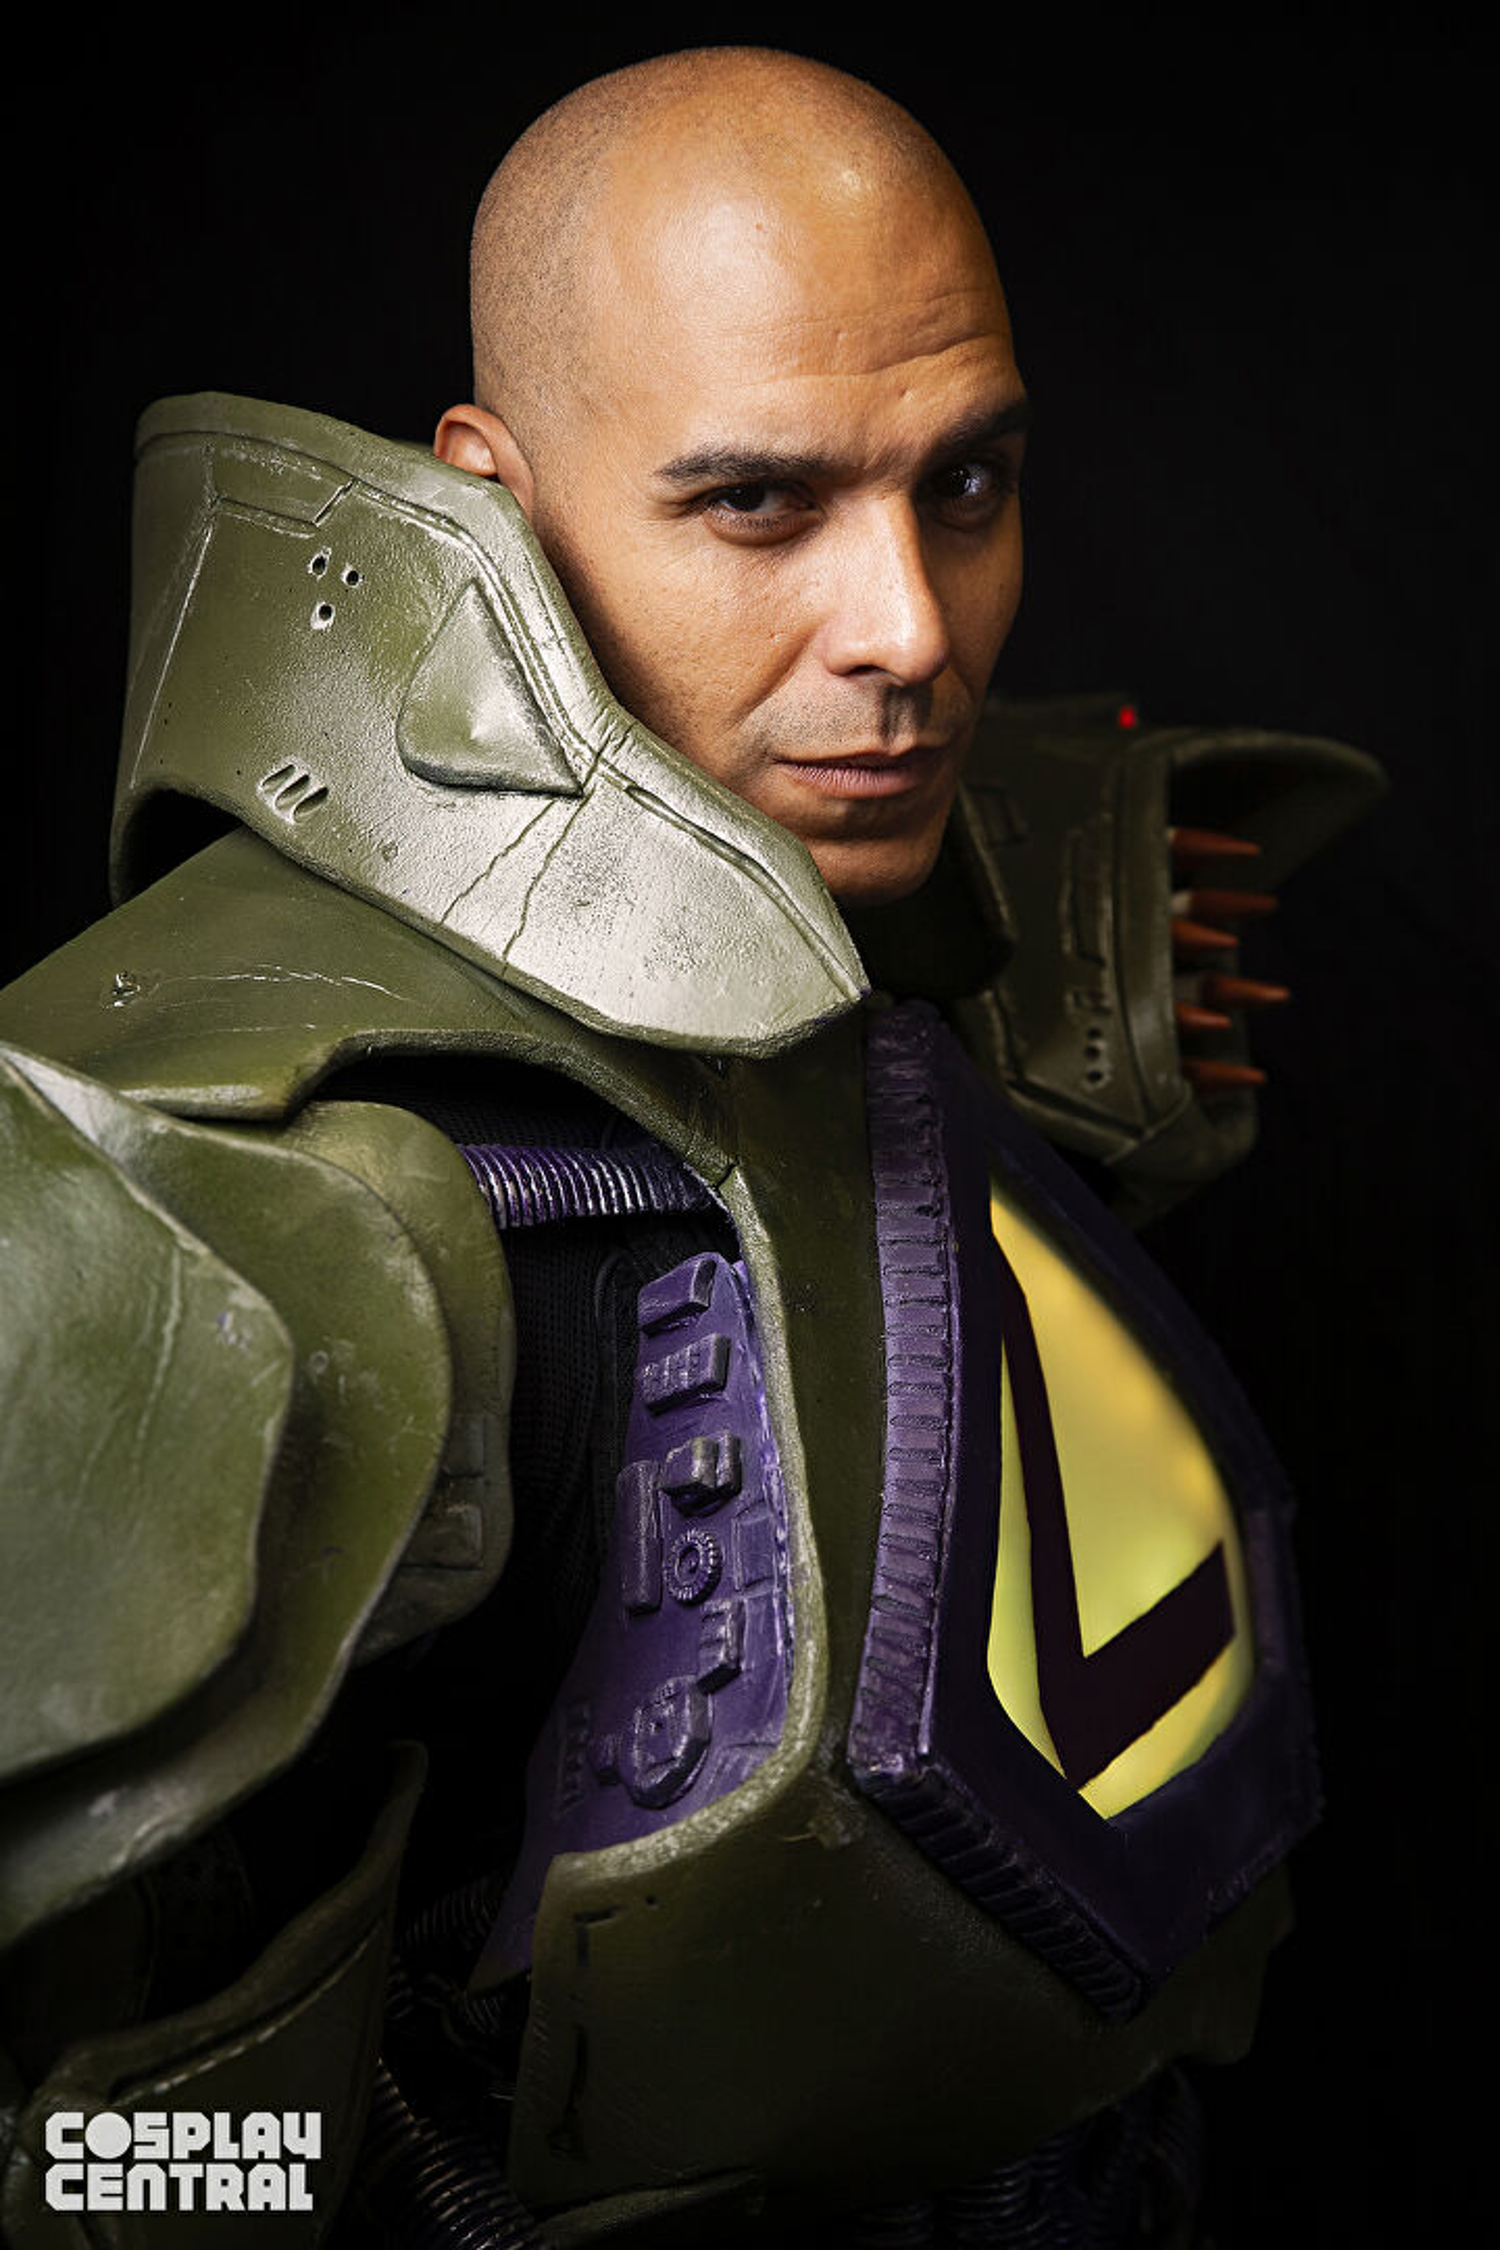 Jamal Johns as Lex Luthor cosplay